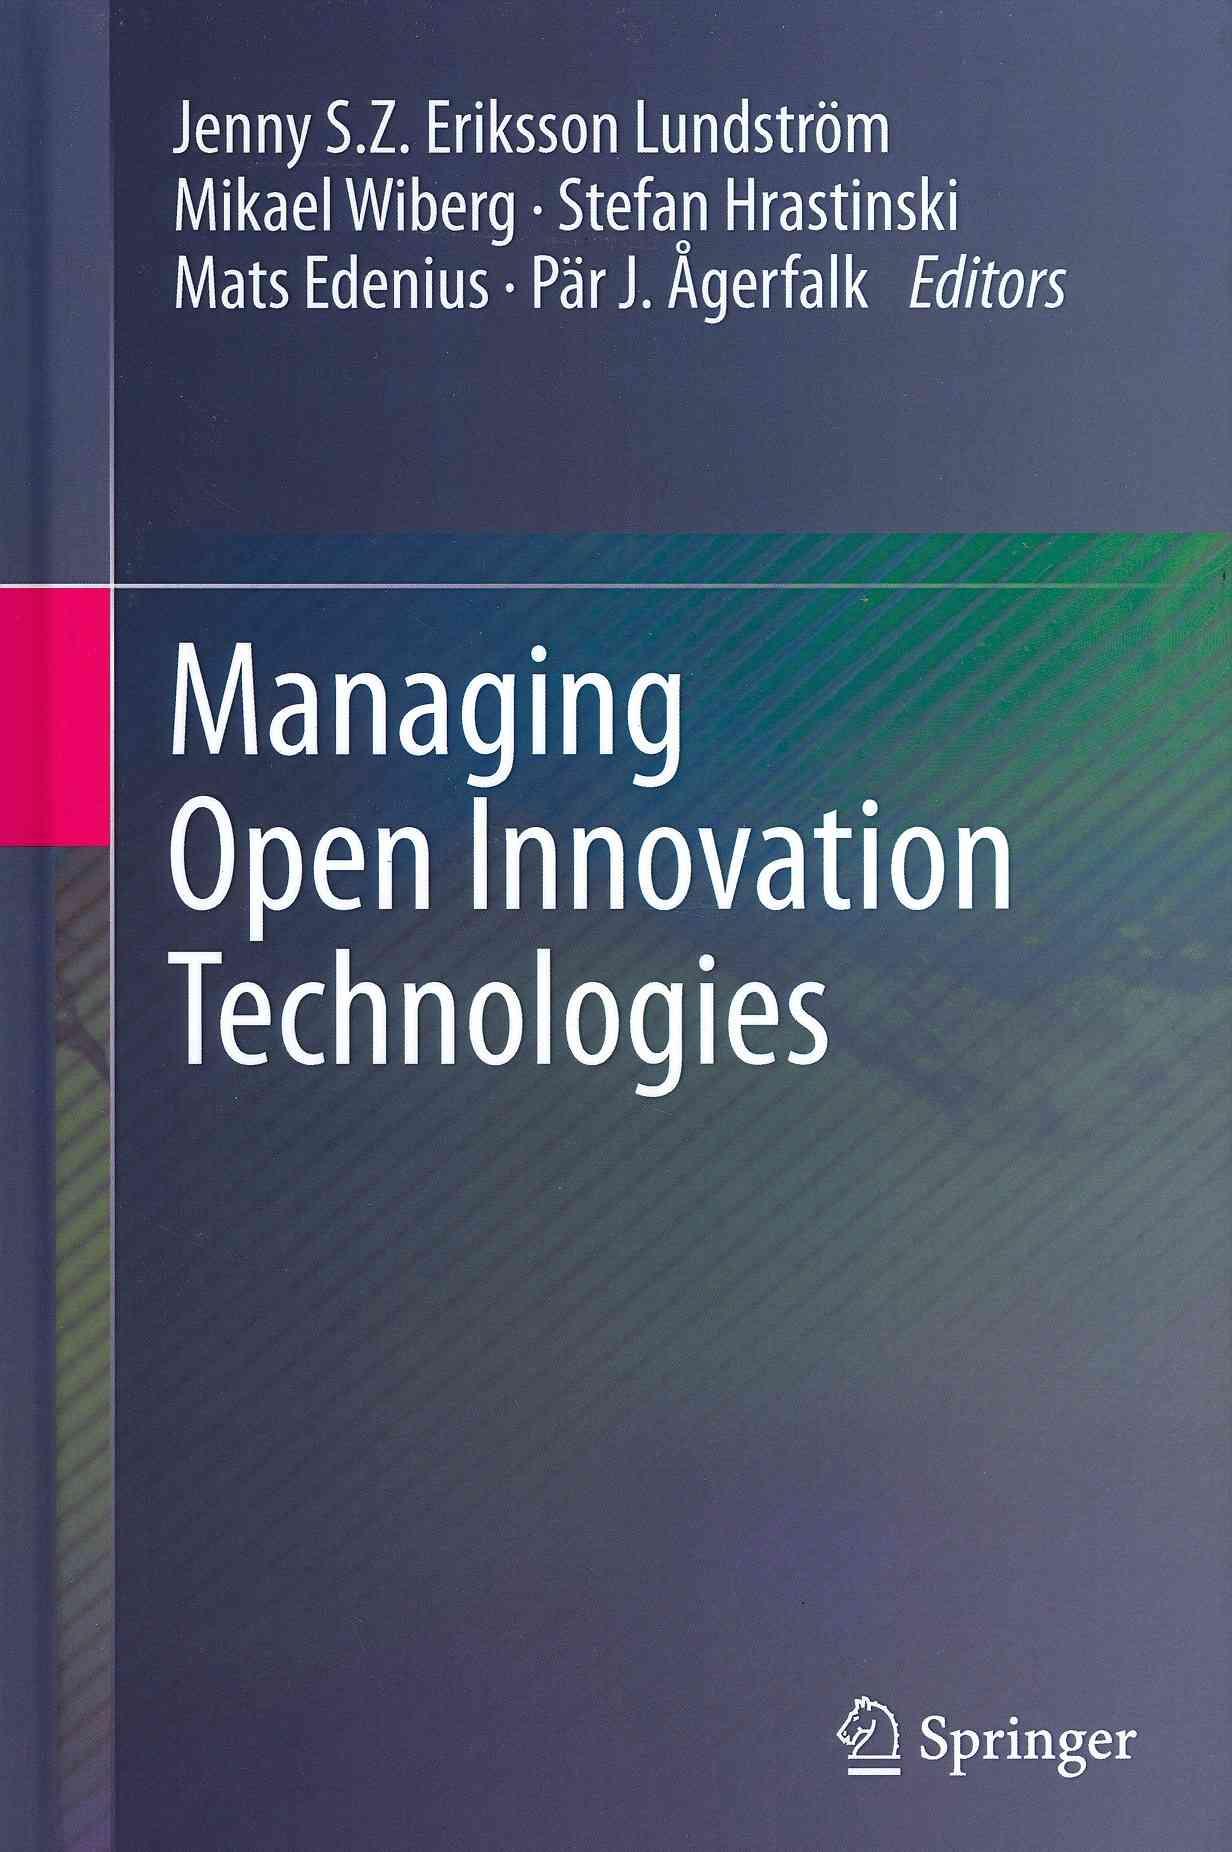 Managing Open Innovation Technologies By Lundstrom, Jenny Eriksson S. Z. (EDT)/ Wiberg, Mikael (EDT)/ Hrastinski, Stefan (EDT)/ Edenius, Mats (EDT)/ Agerfalk, Par J. (EDT)